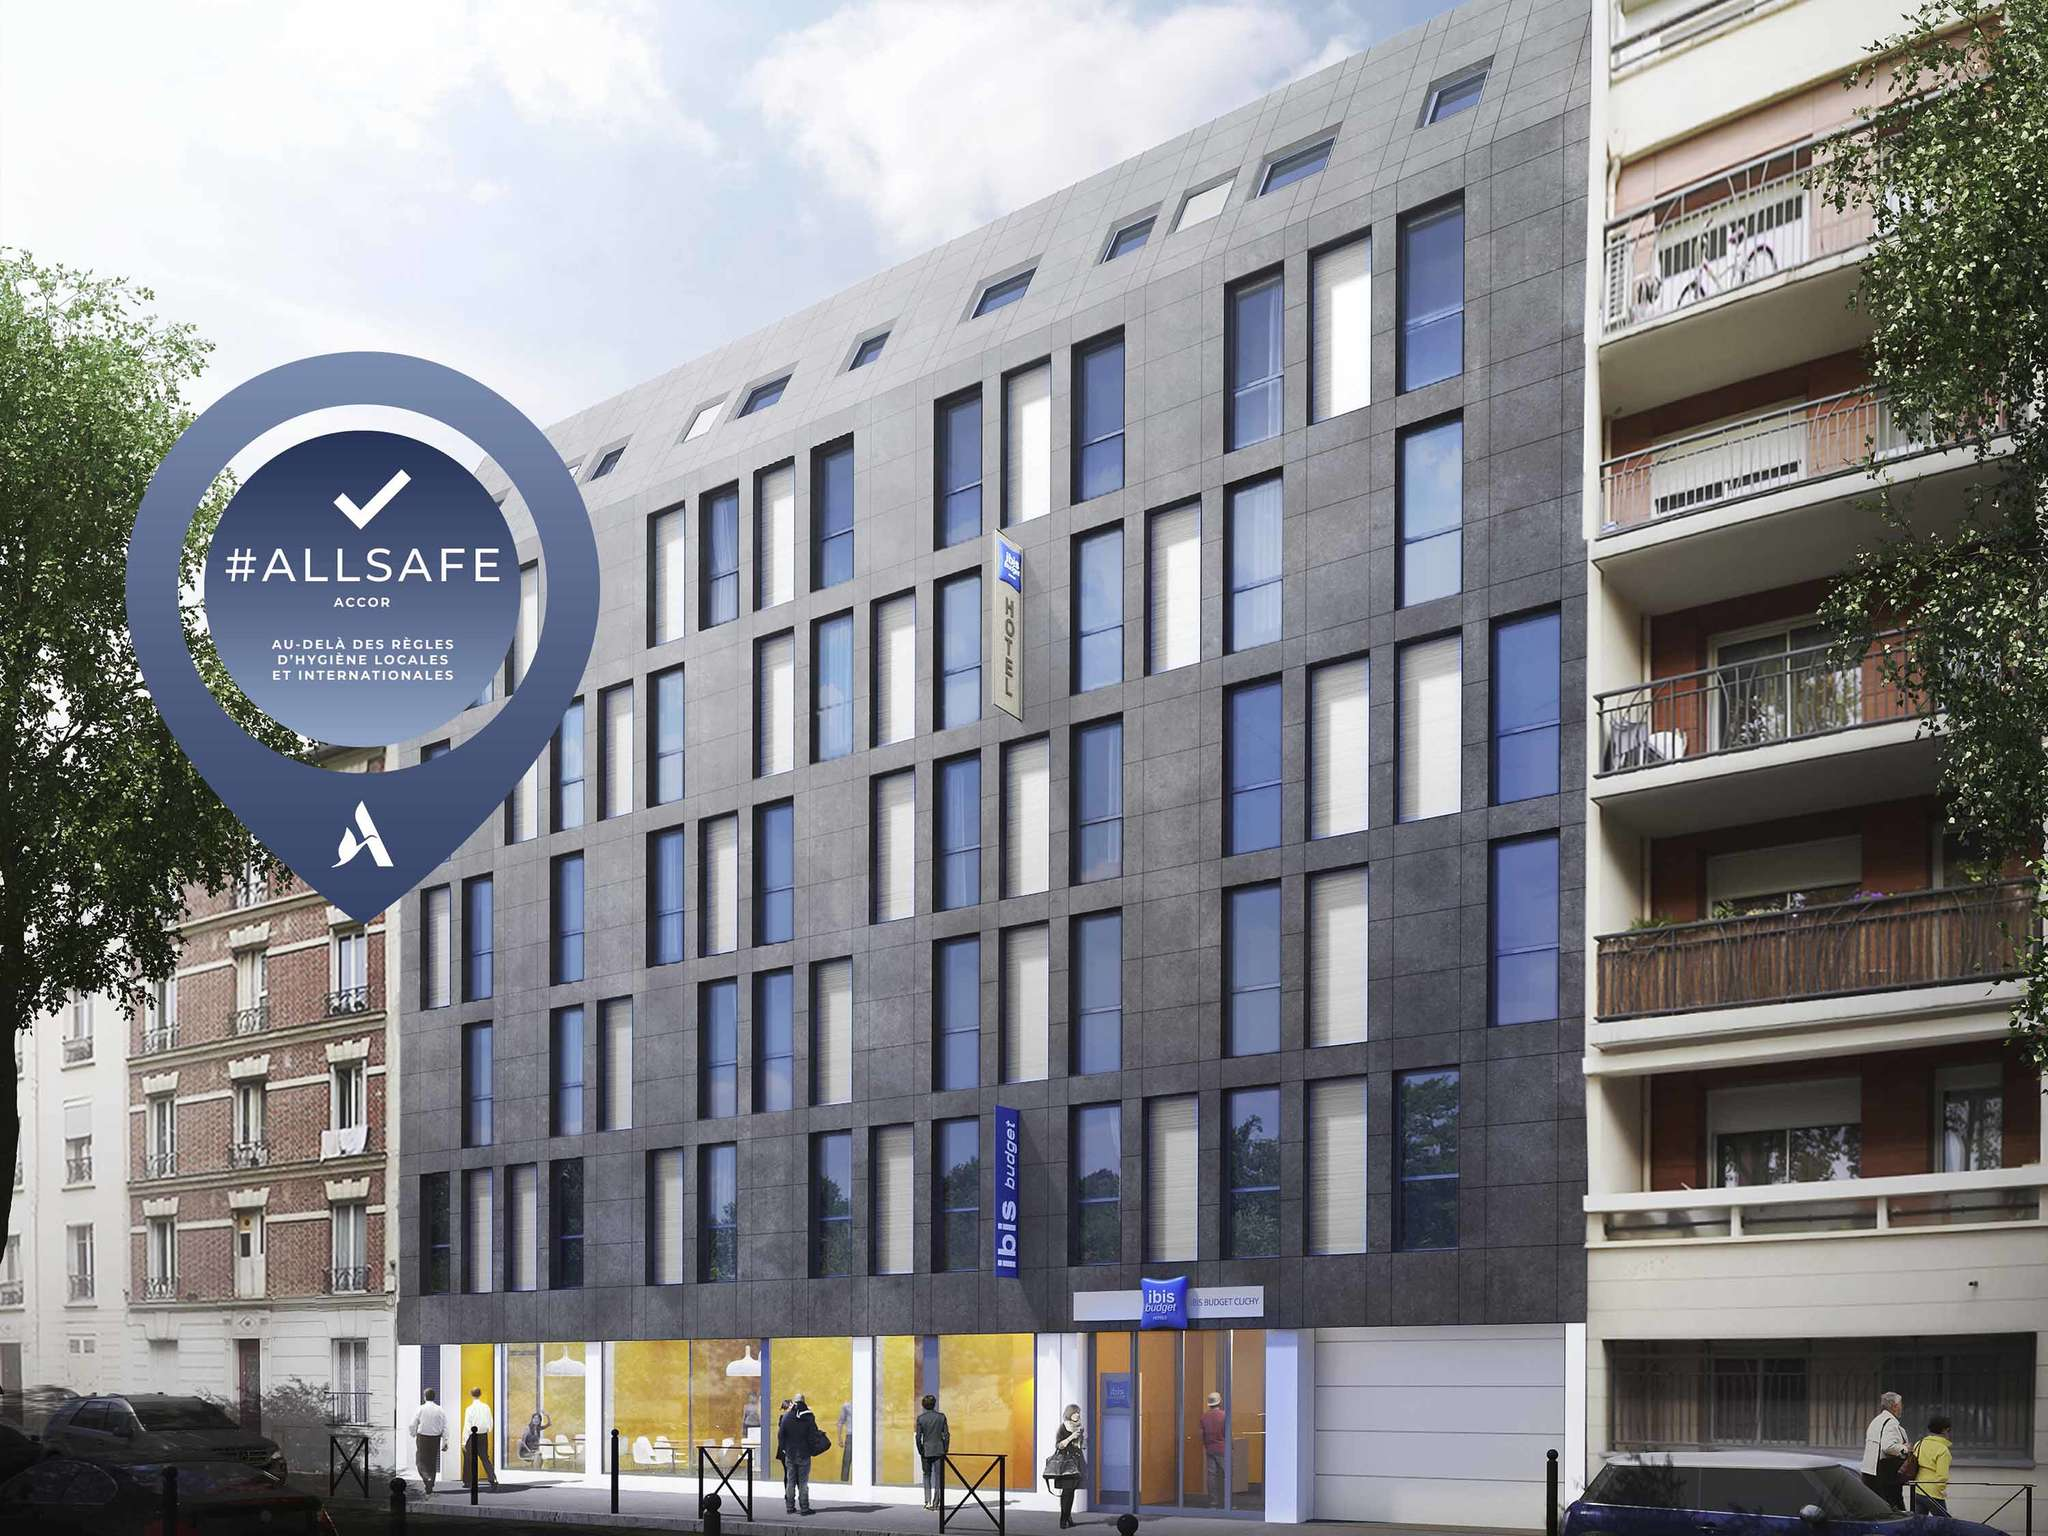 Hotel - ibis budget Paris Clichy Mairie (Opening April 2018)